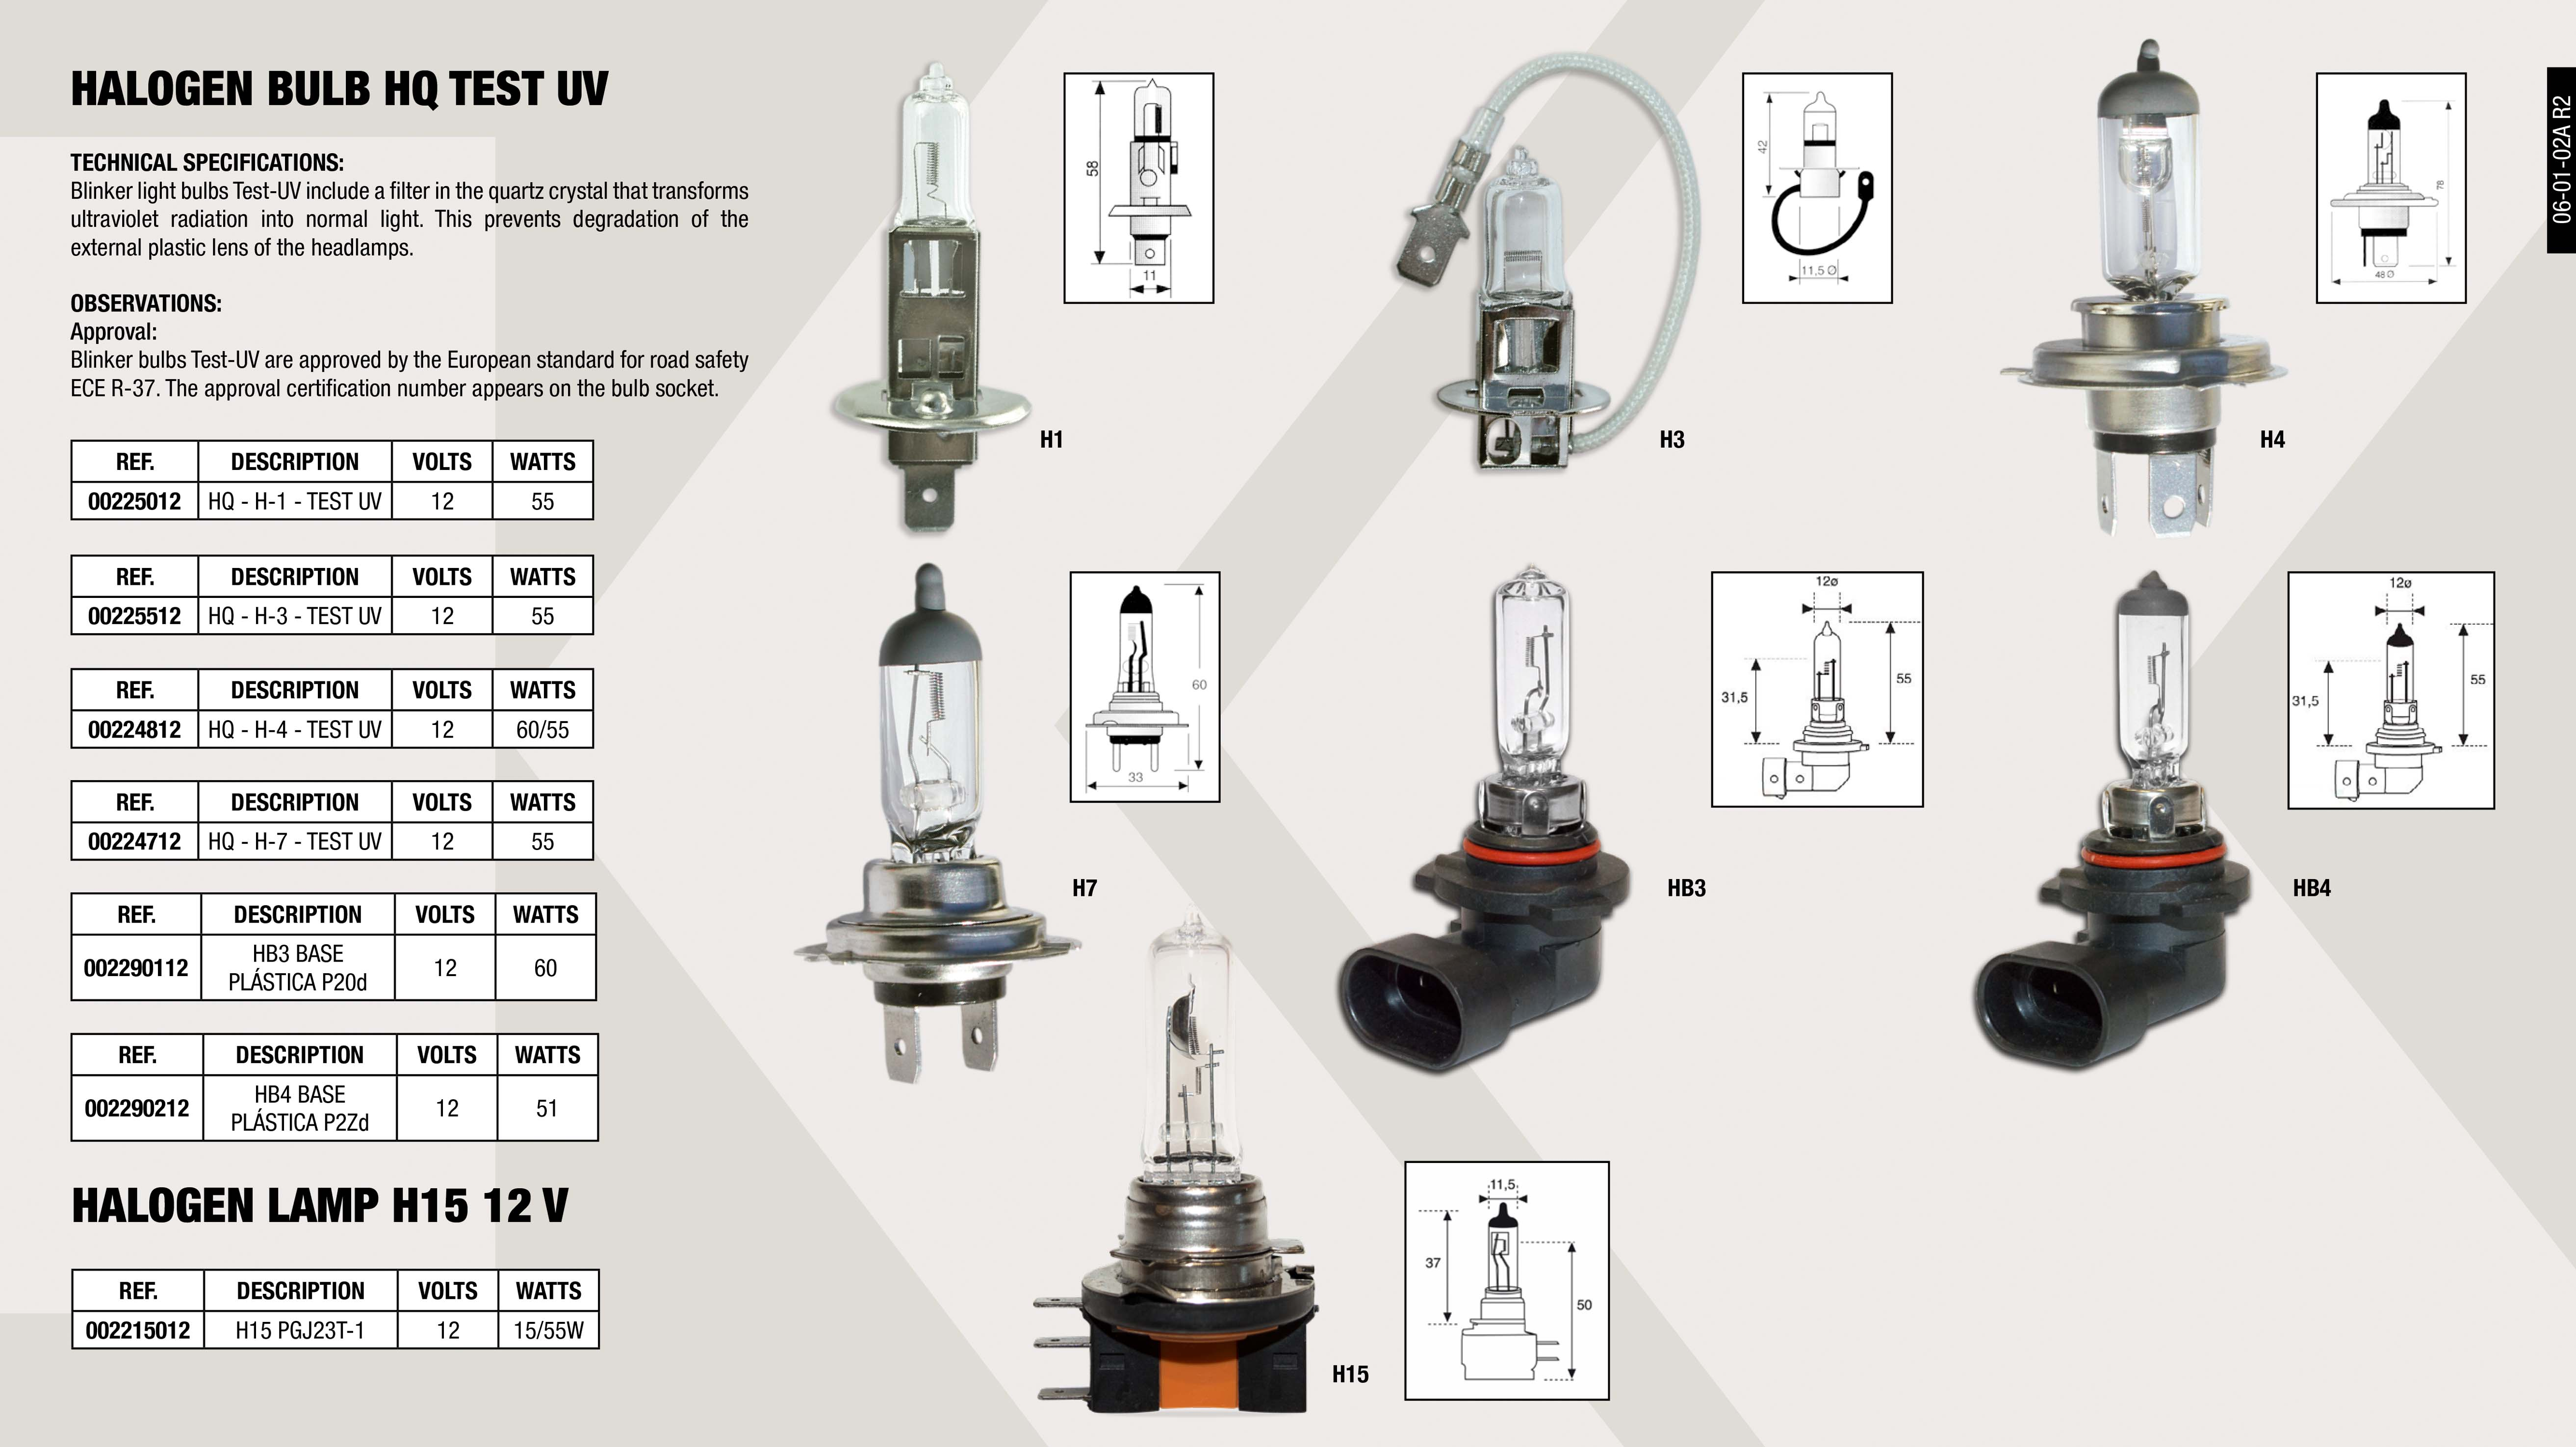 H3 HALOGENE TEST UV HQ LAMP 12V. 55W.                       ,  H1 HALOGENE TEST UV HQ LAMP 12V. 55W.                       ,  H4 HALOGENE TEST UV HQ LAMP 12V. 60/55W.                    ,  HB3 LAMP 12V 60W                                            ,  H7 HALOGENE TEST UV HQ LAMP 12V. 55W.                       ,  HB4 LAMP 12V 51W                                            ,